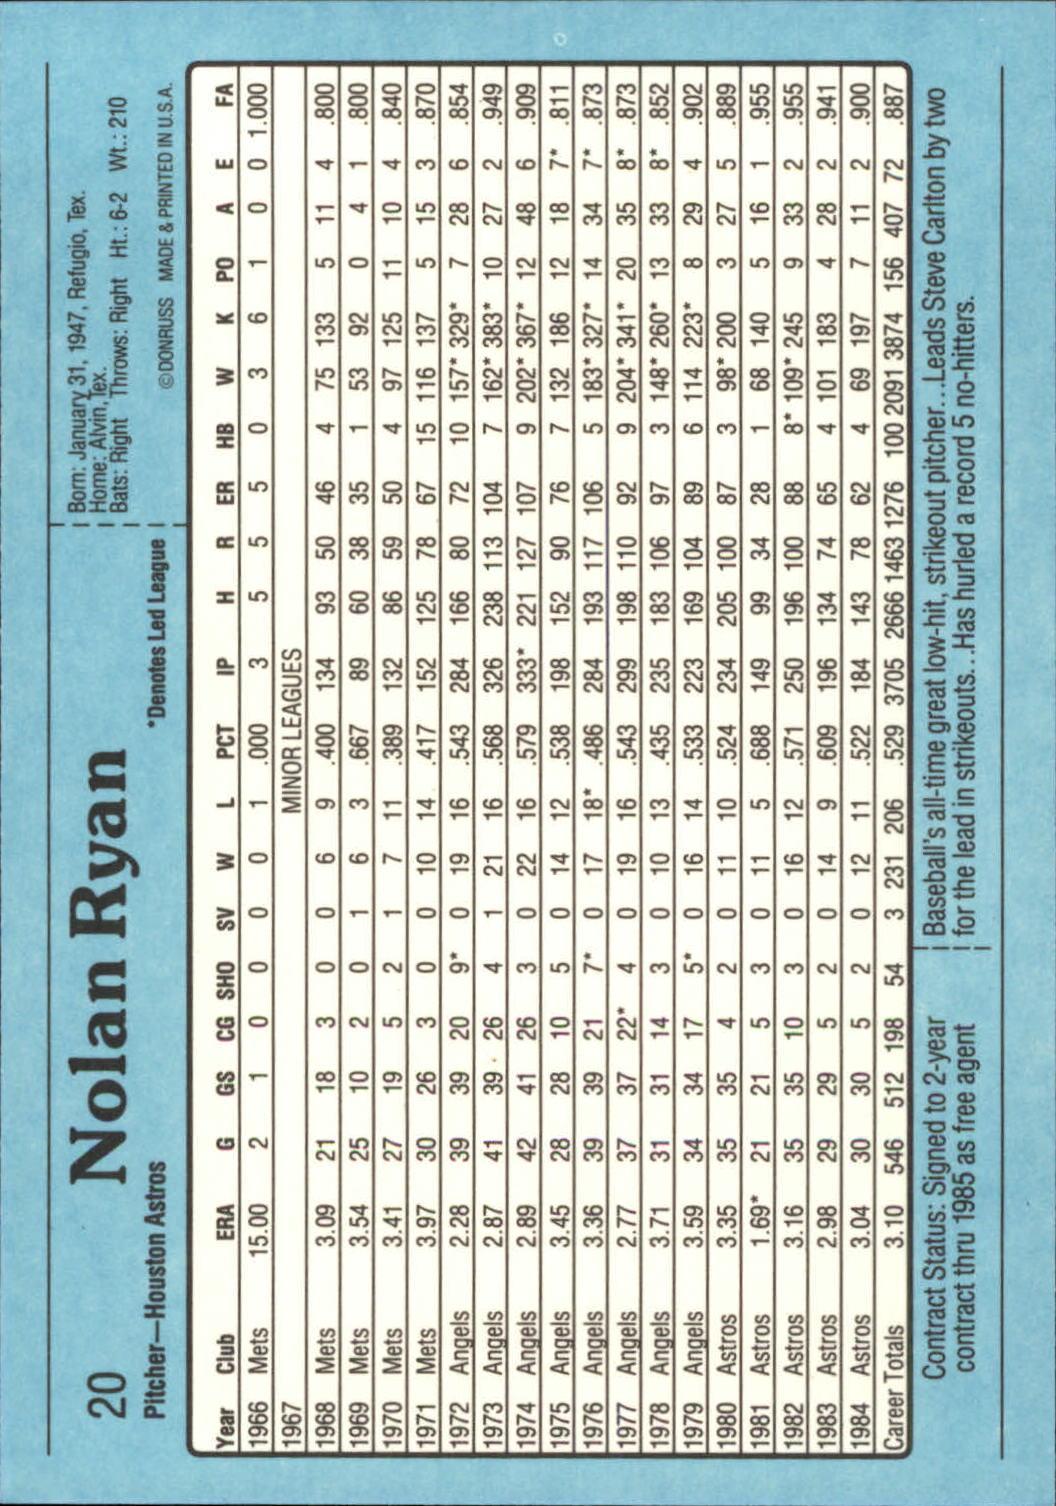 1985 Donruss Action All-Stars #20 Nolan Ryan back image